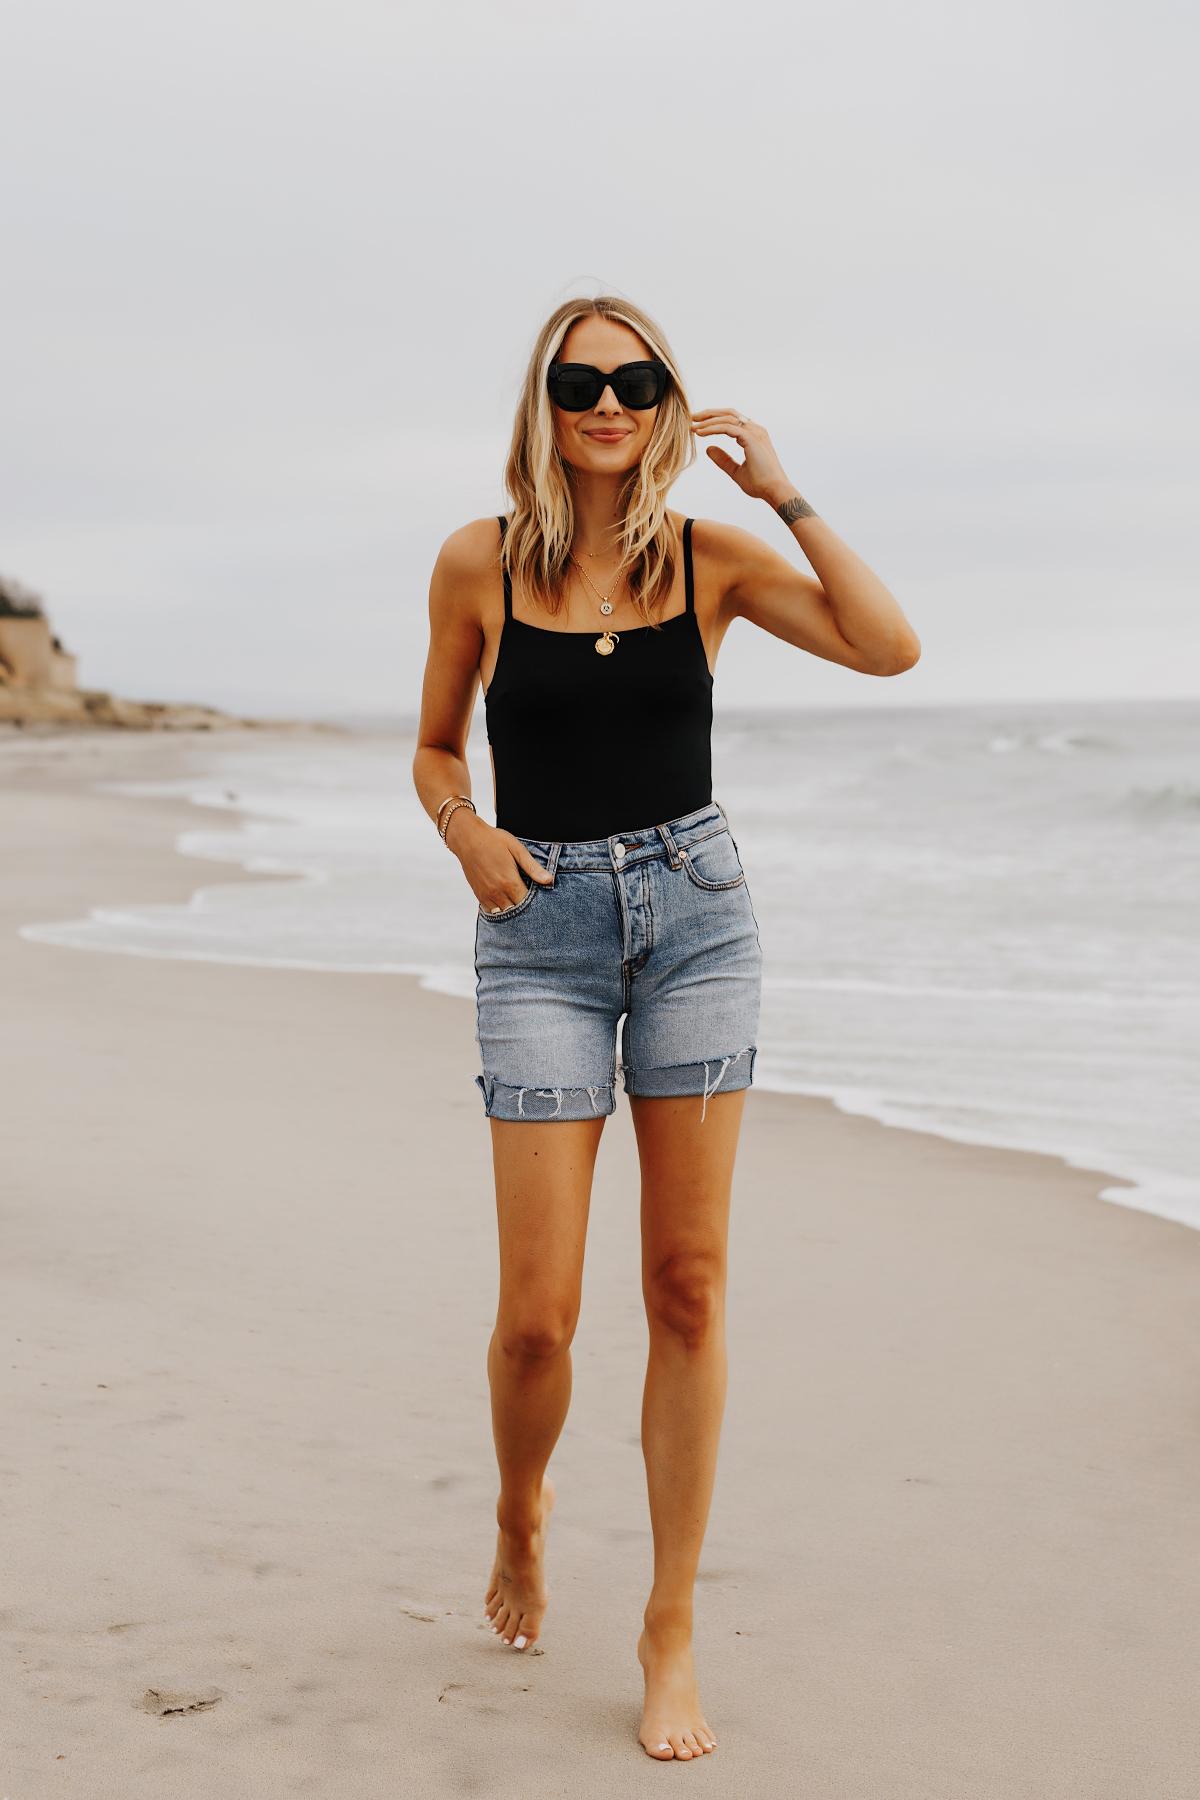 Fashion Jackson Wearing L Space Black One Piece Swimsuit Free People Long Denim Shorts San Diego Beach Weekend